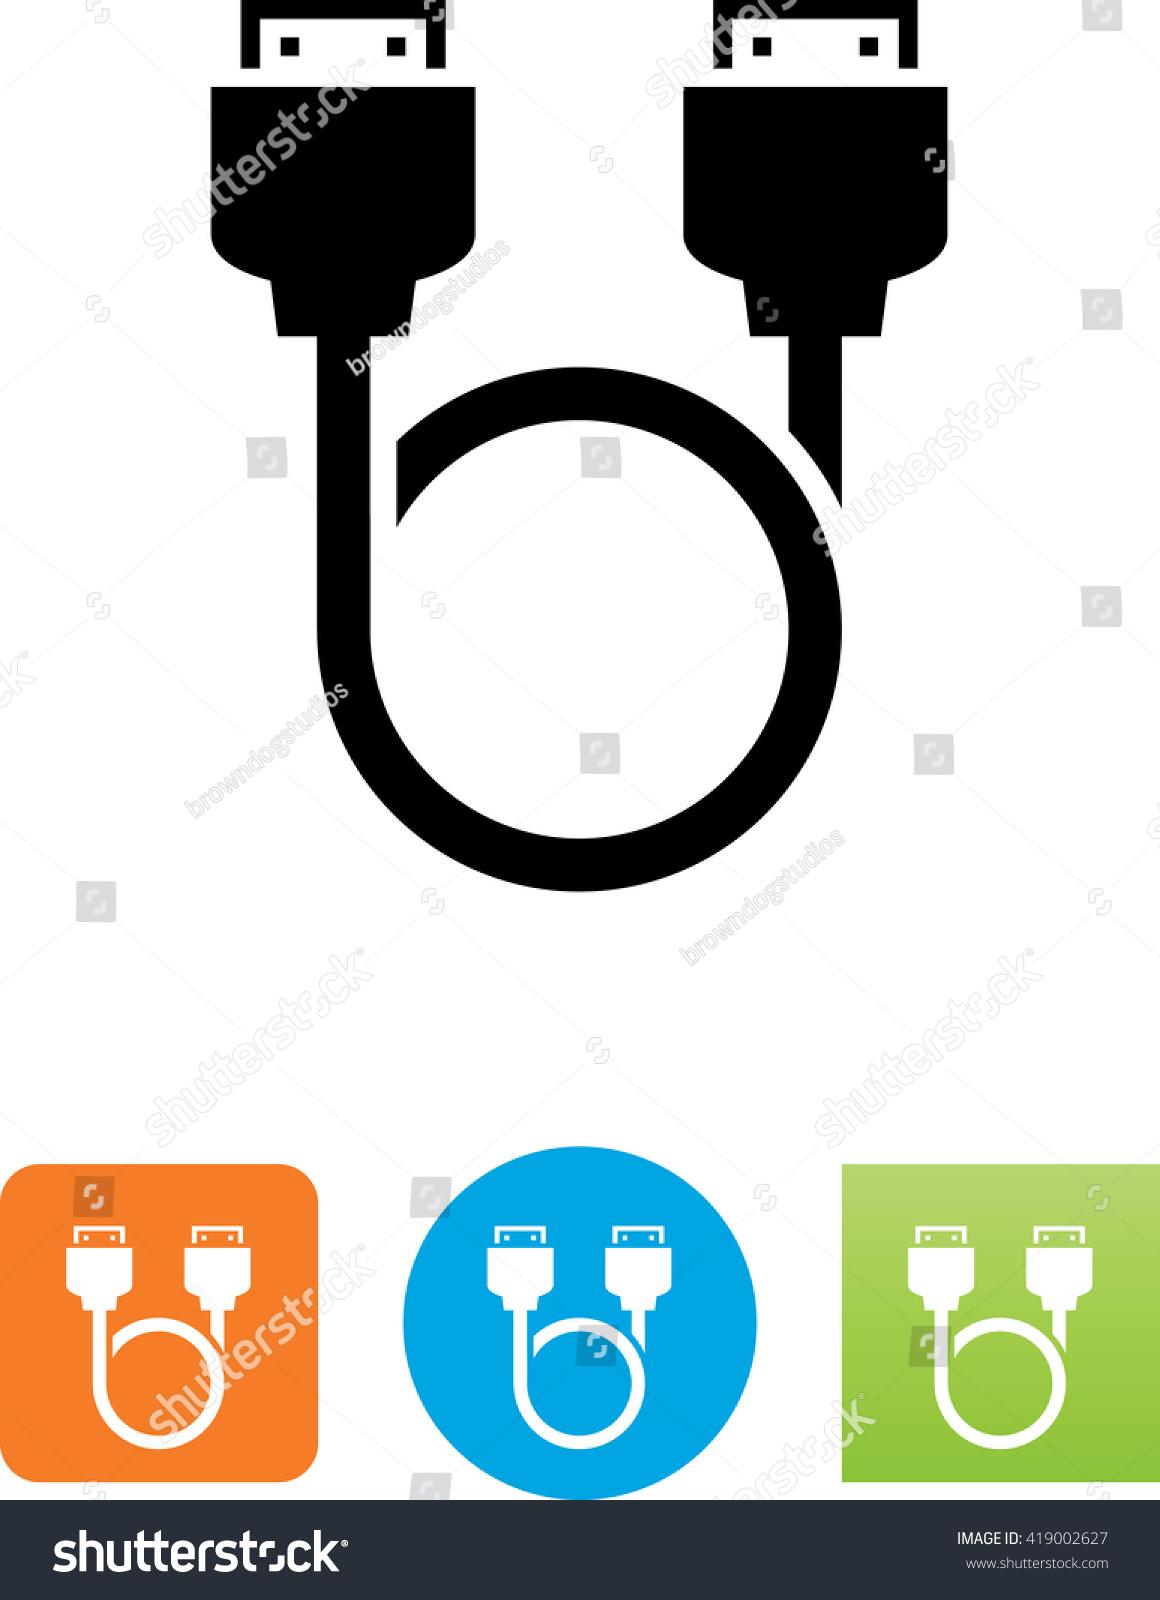 Looping Hdmi Cable Symbol Stock Vector Royalty Free 419002627